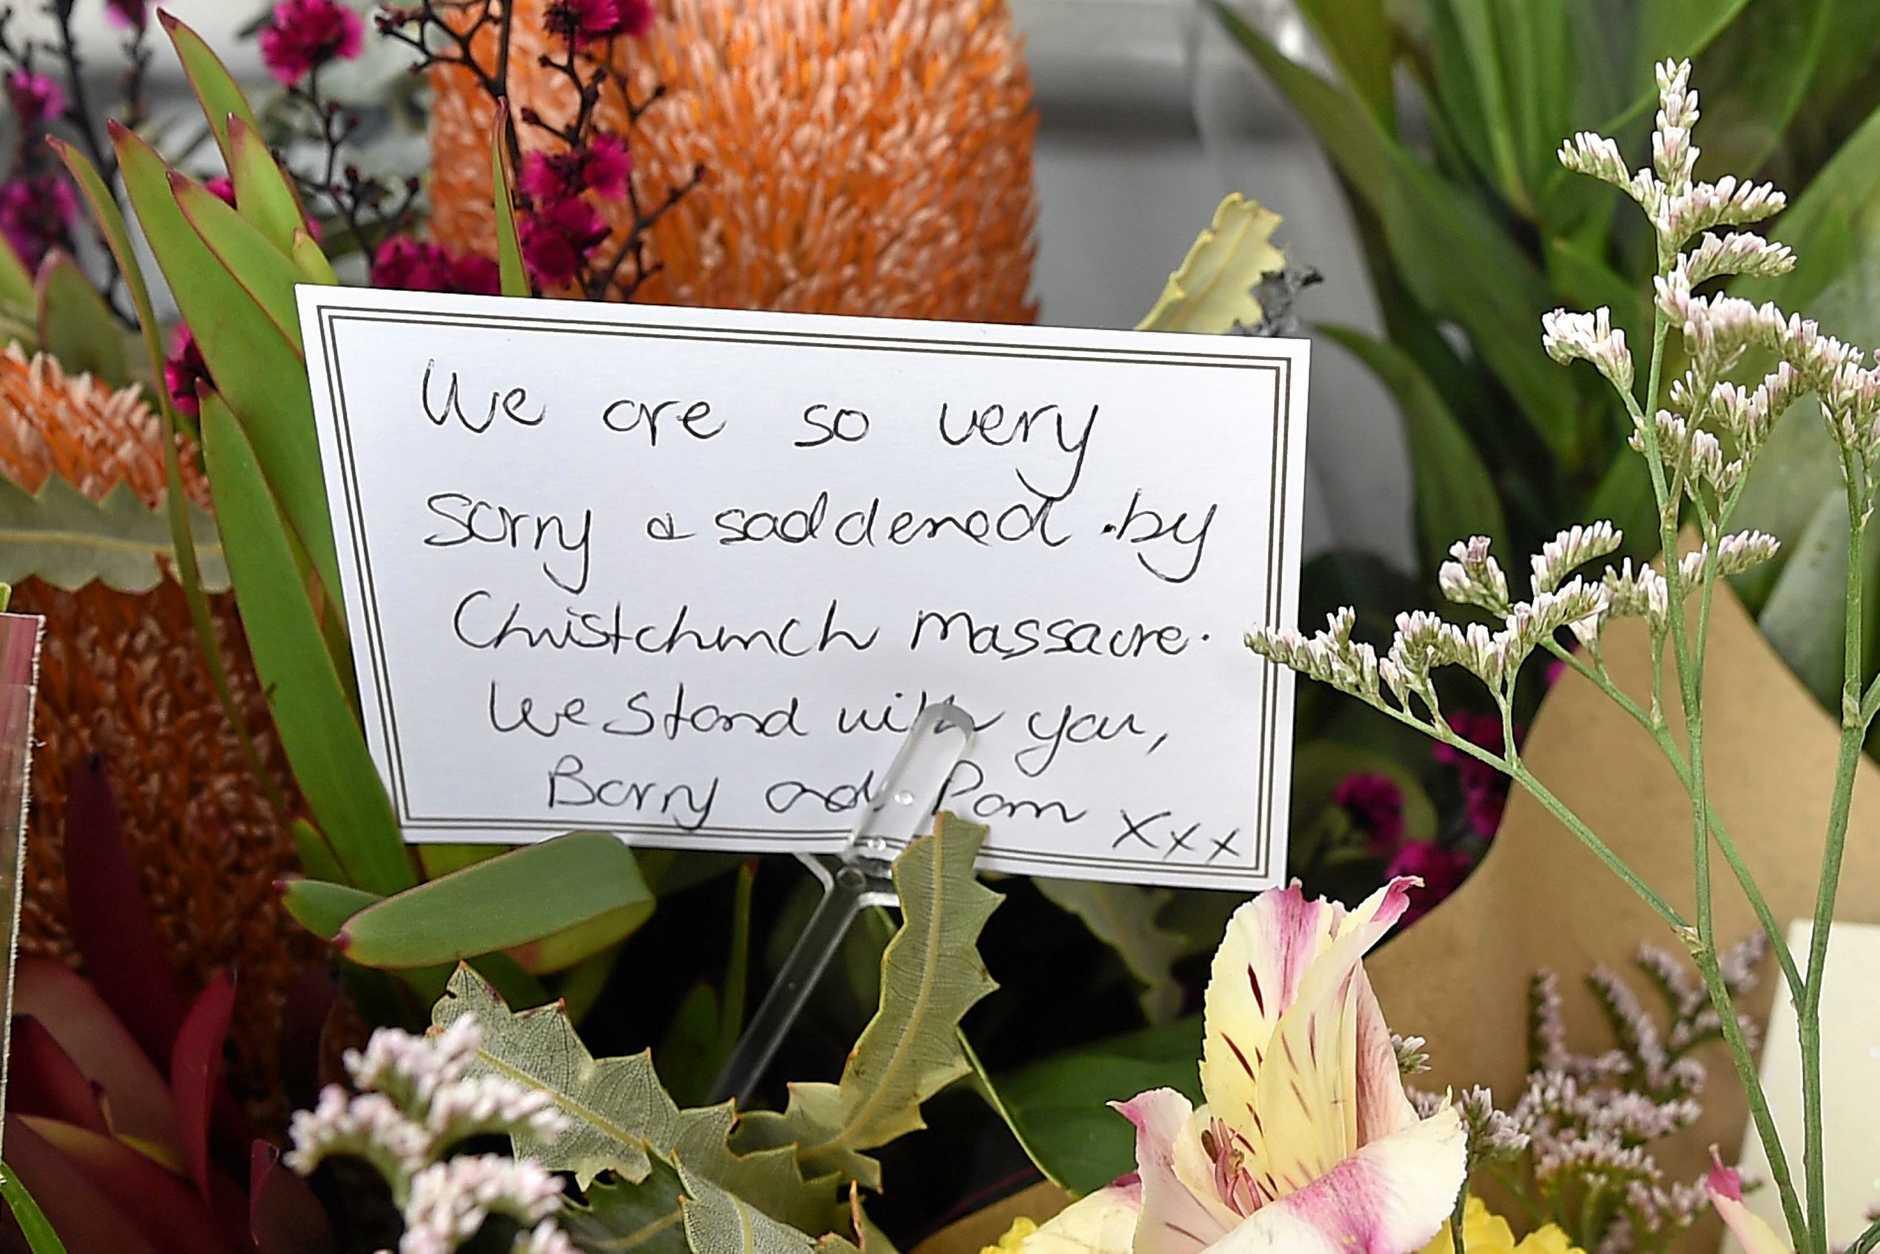 Senior constable Matt Clark reads messages of hope left at the Mosquem of Sunshine Coast.